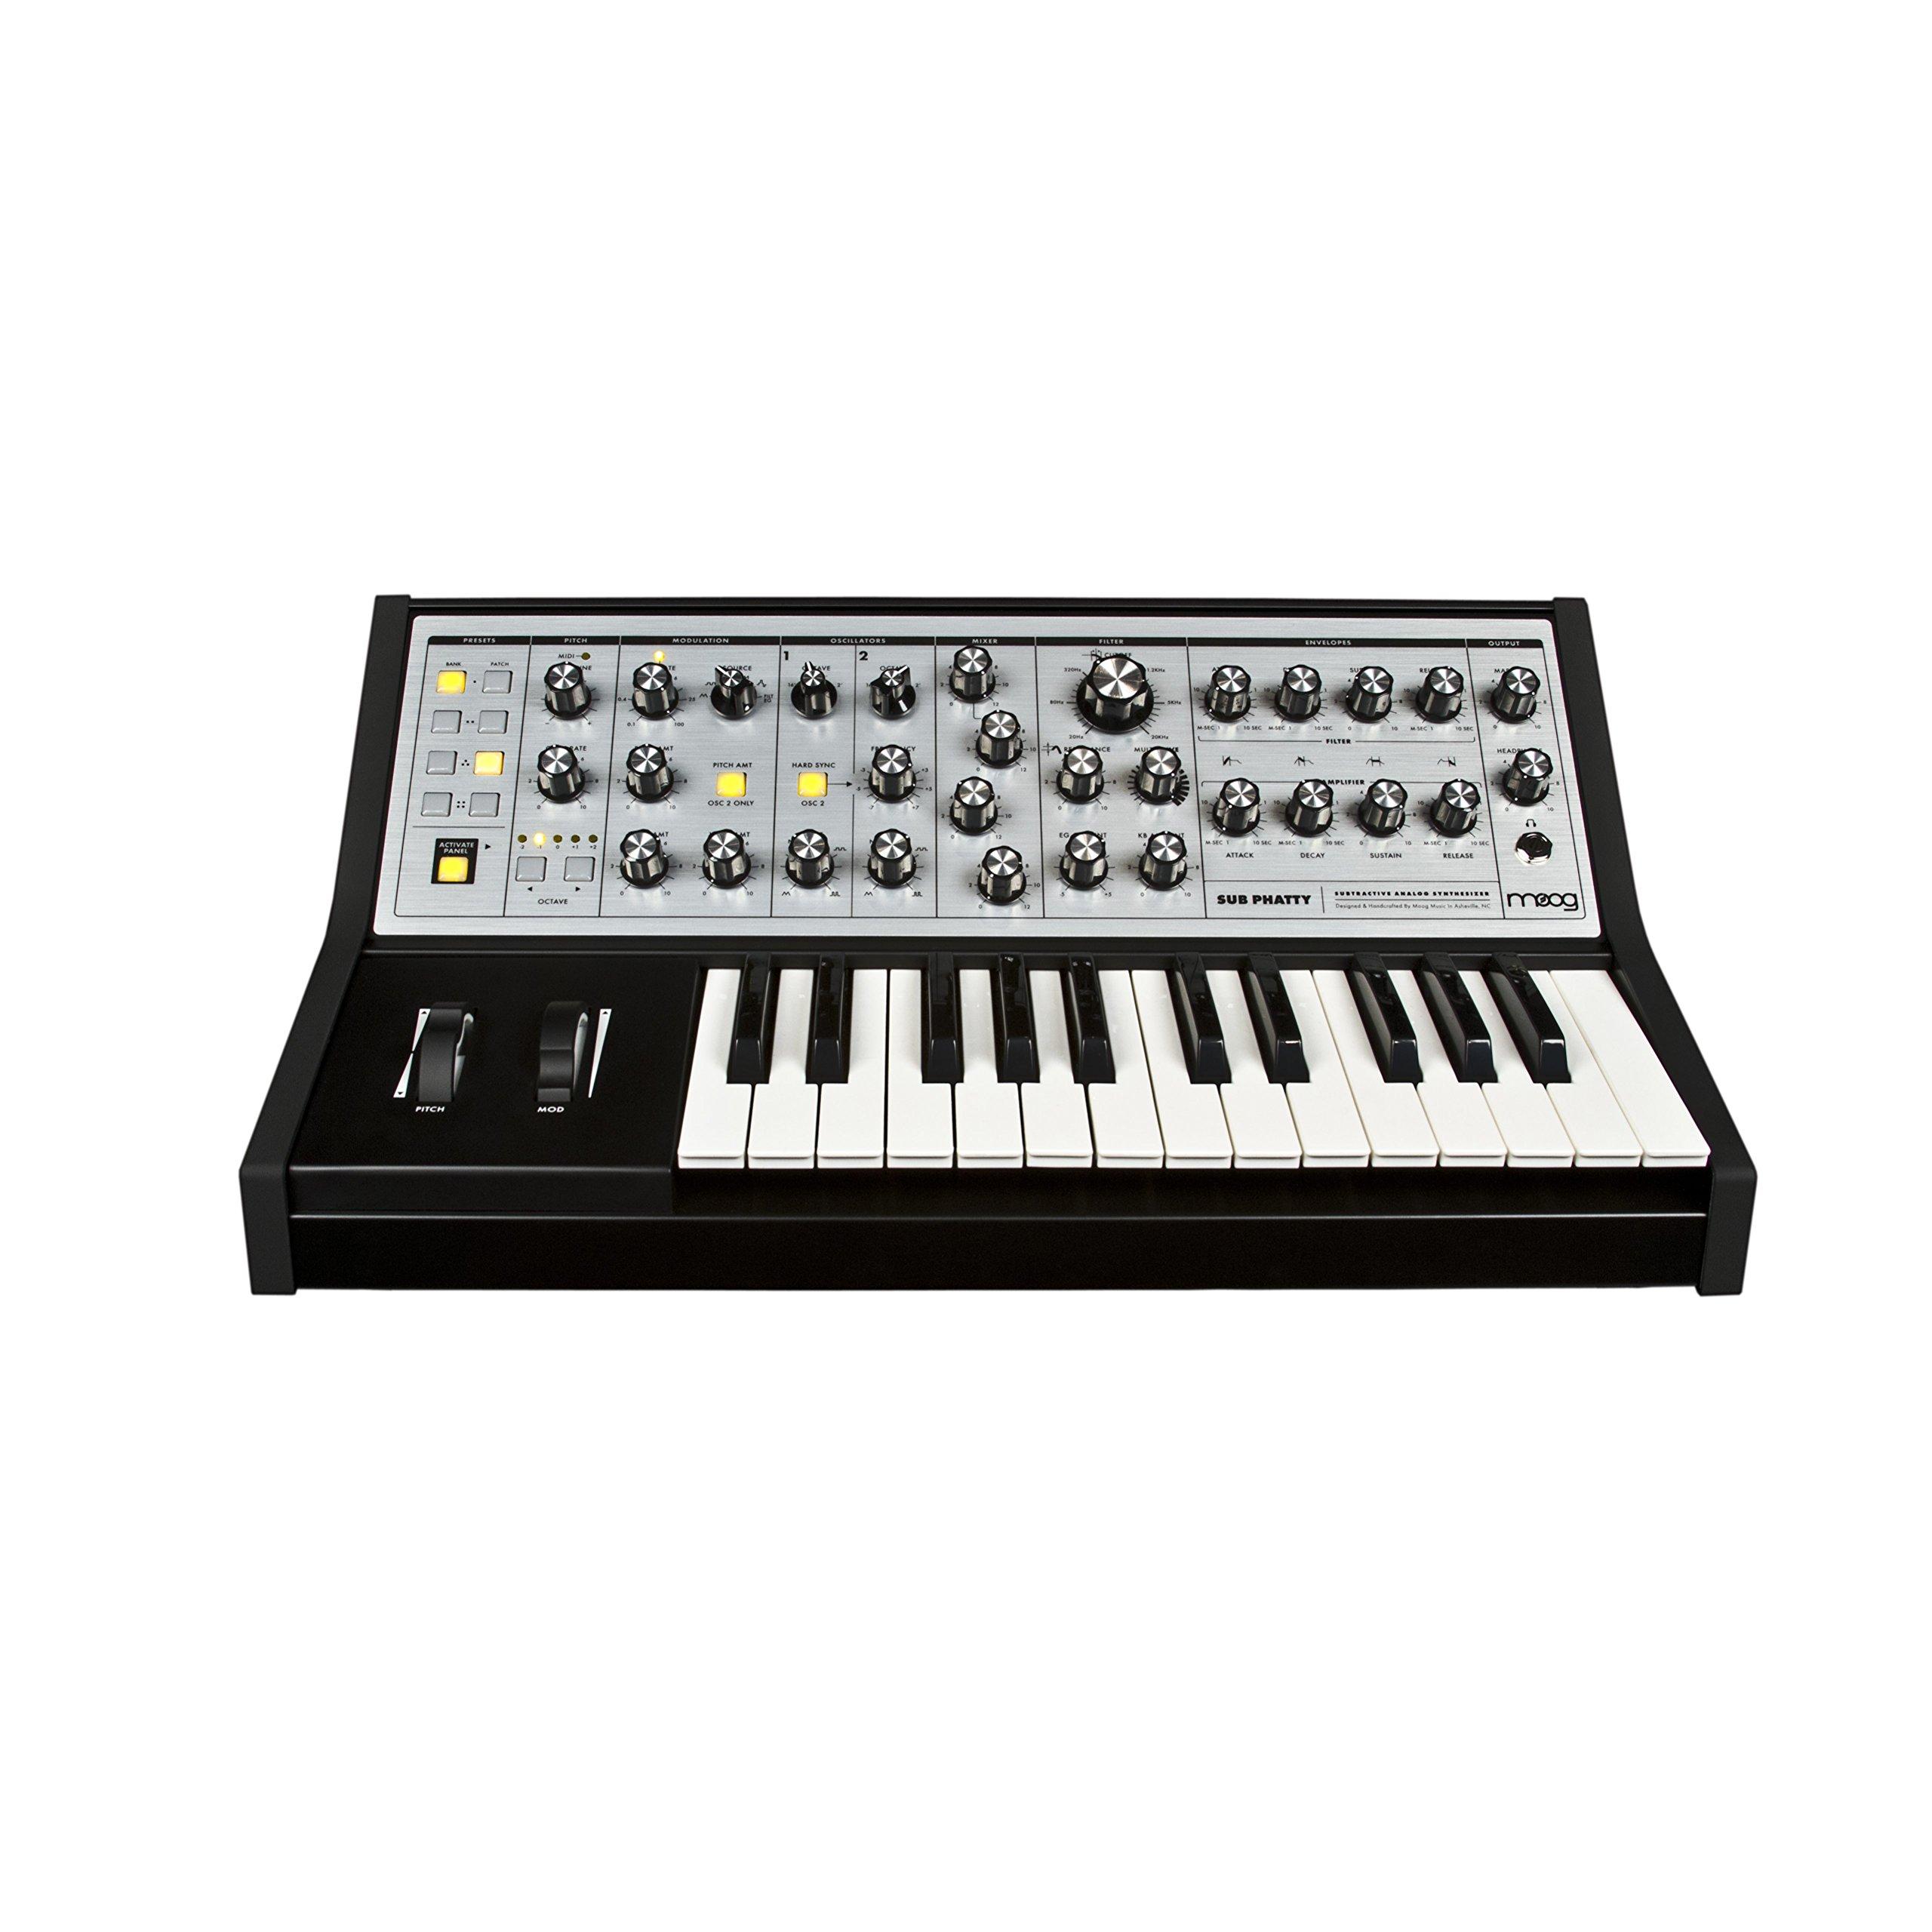 Moog Sub Phatty 25-Key Analog Synthesizer by Moog Music Inc.